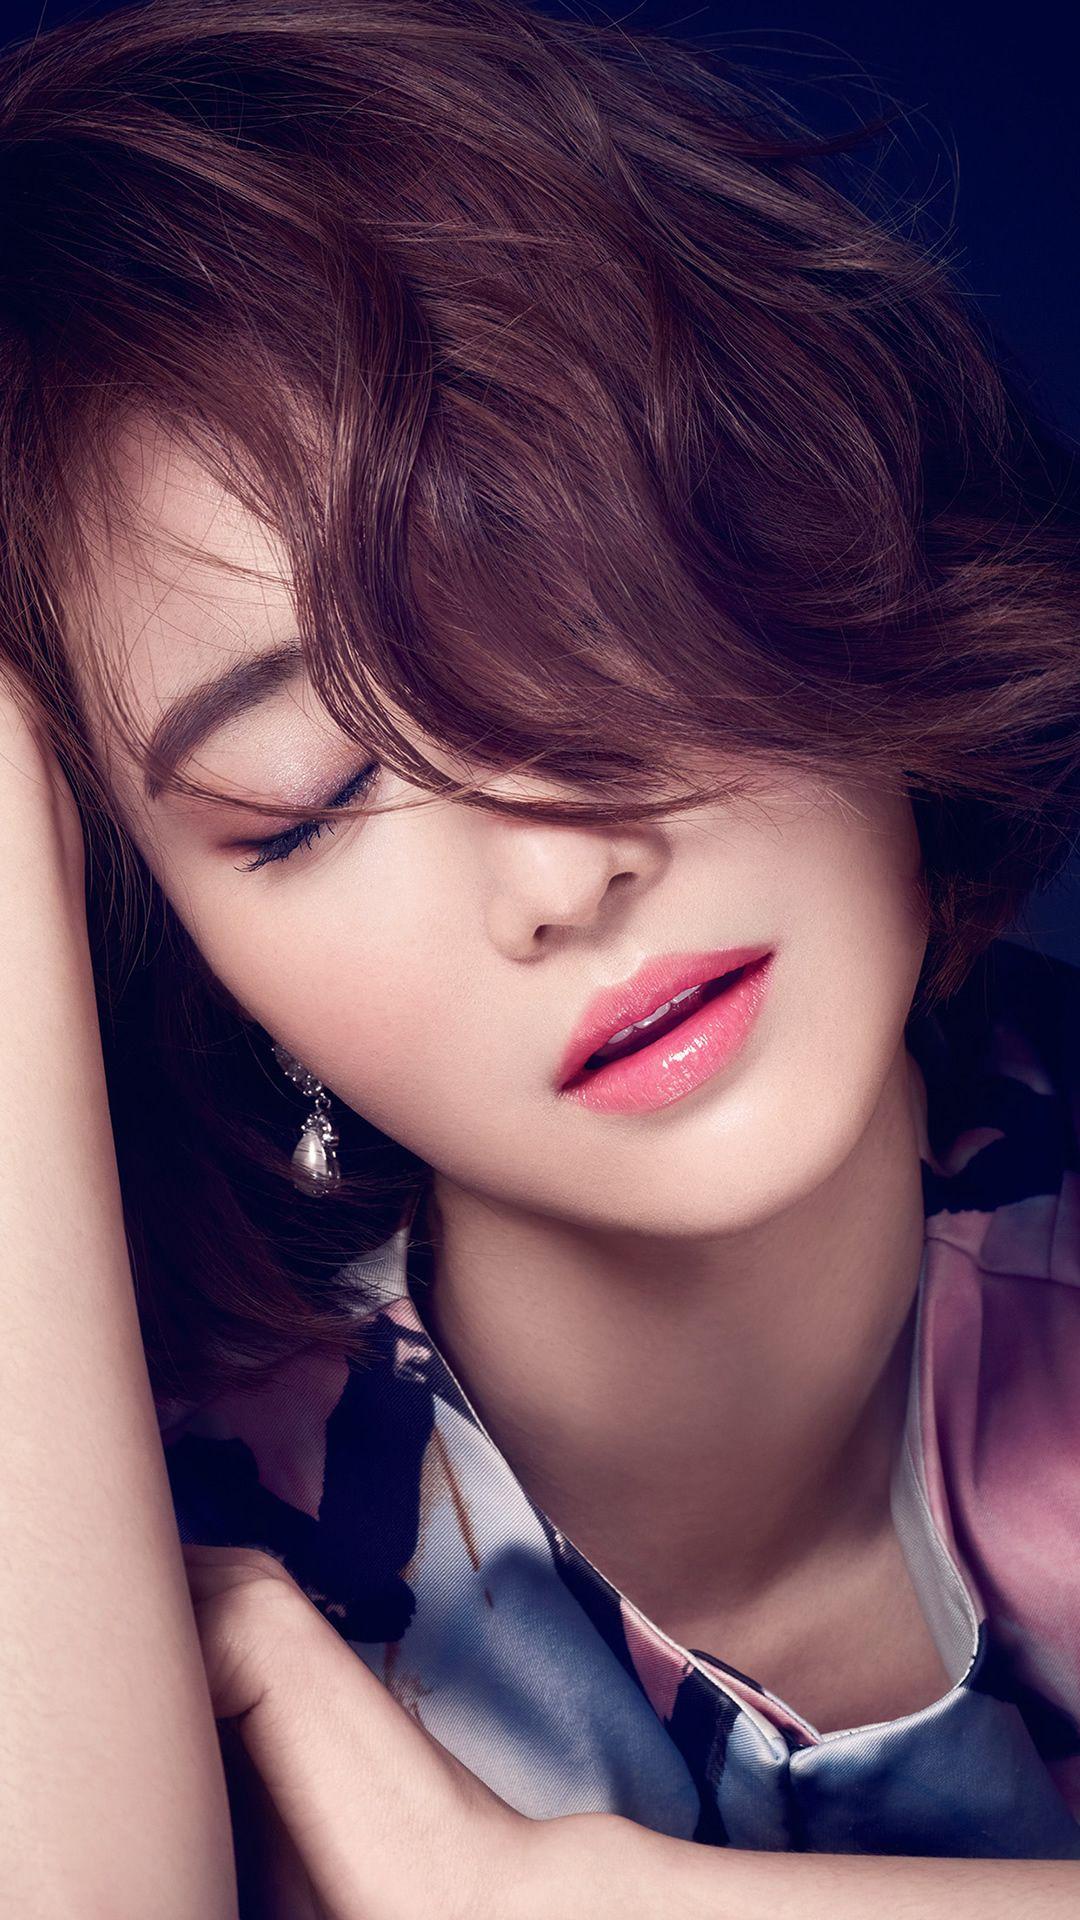 ko joon hee kpop film actress closed eyes iphone 6 wallpaper